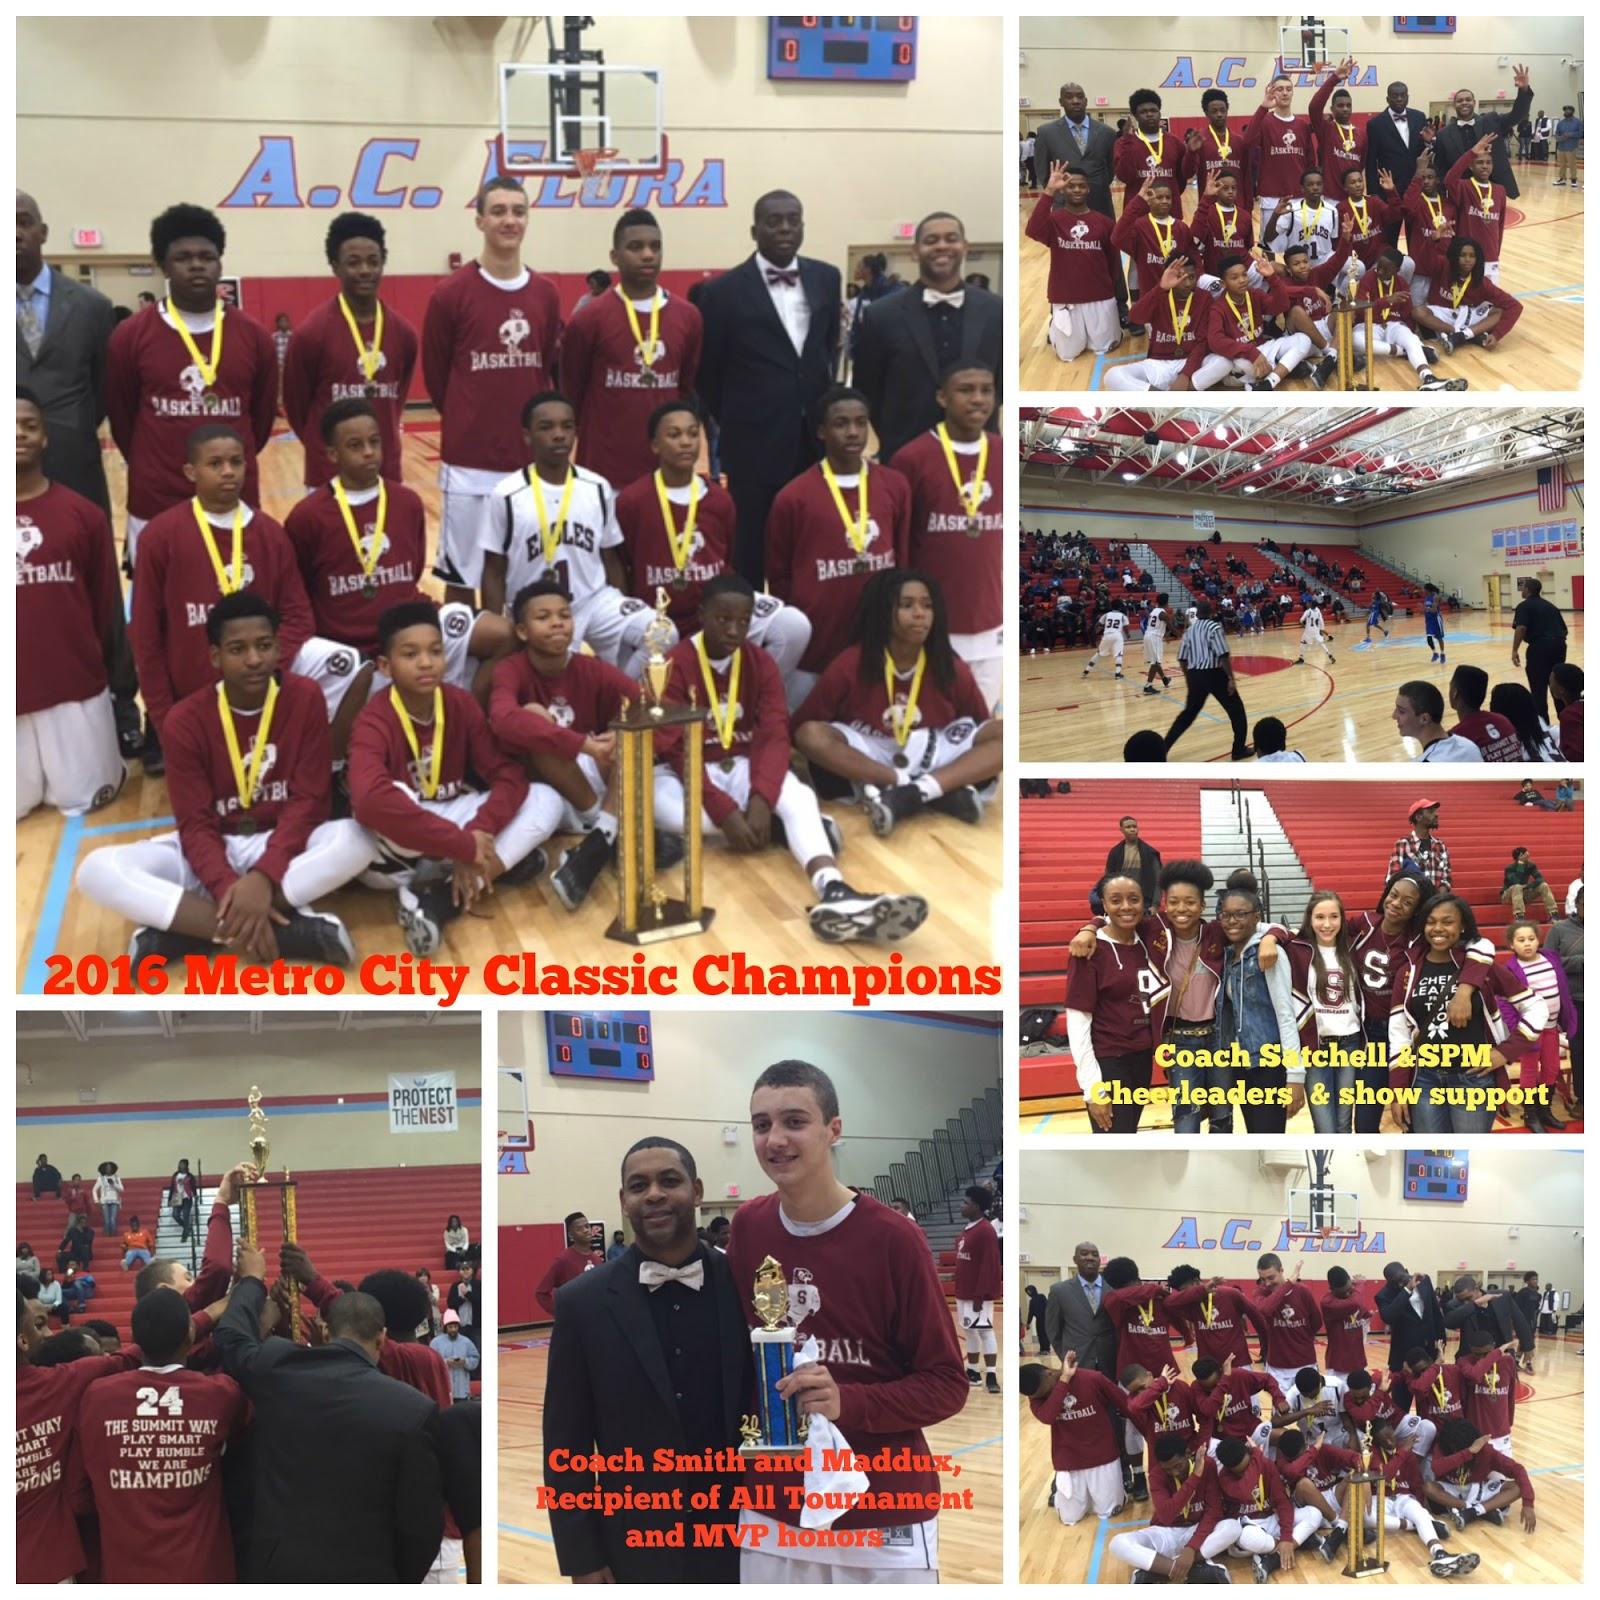 SUMMIT UP NEWS: SPMS Boys Basketball Team Win the Metro City